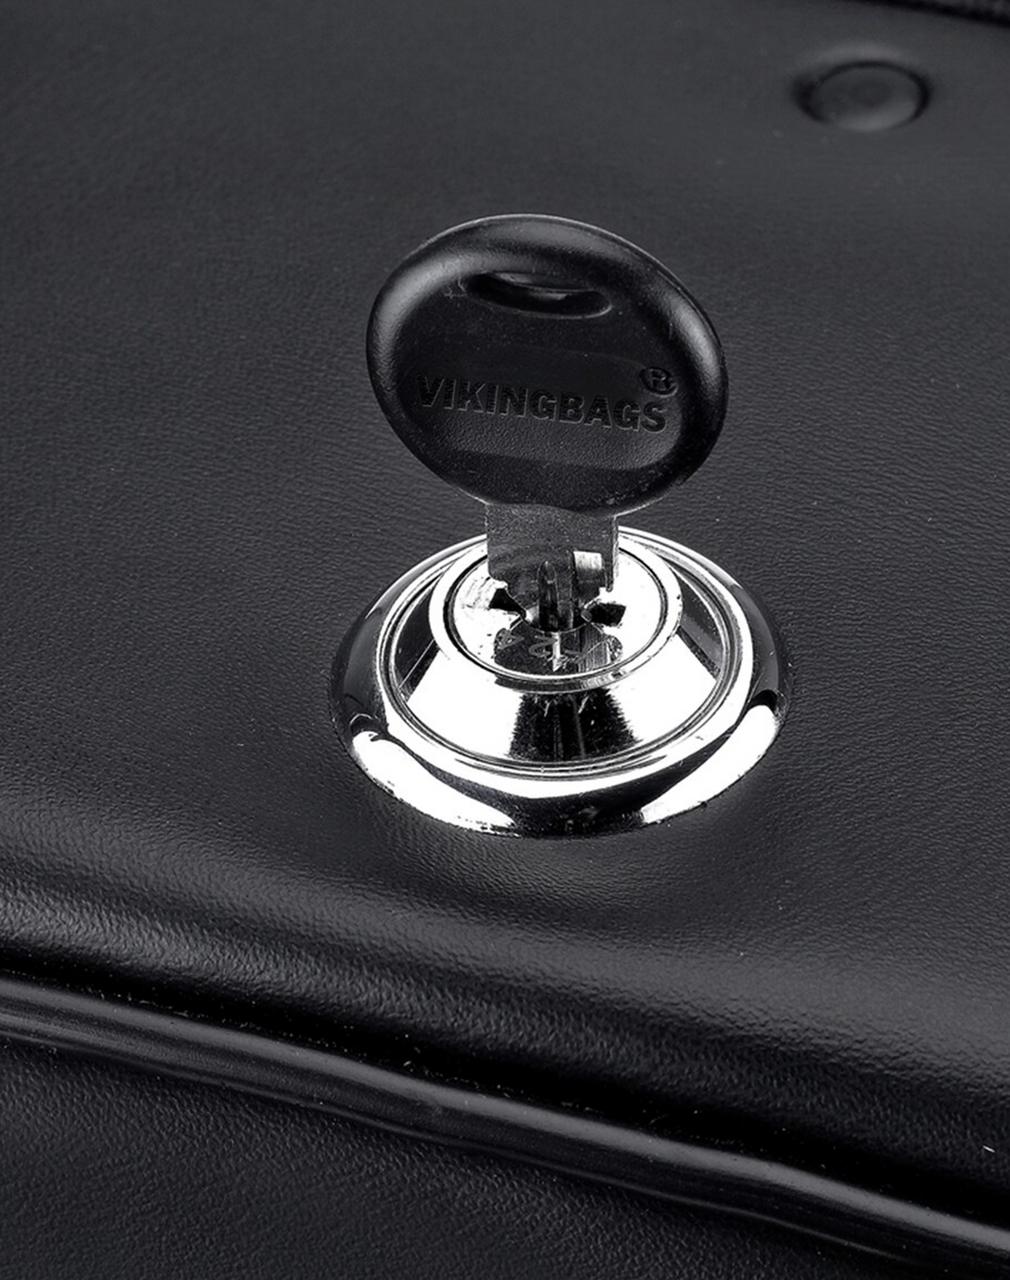 Honda 1100 Shadow Sabre Charger Single Strap Large Motorcycle Saddlebags lock key view